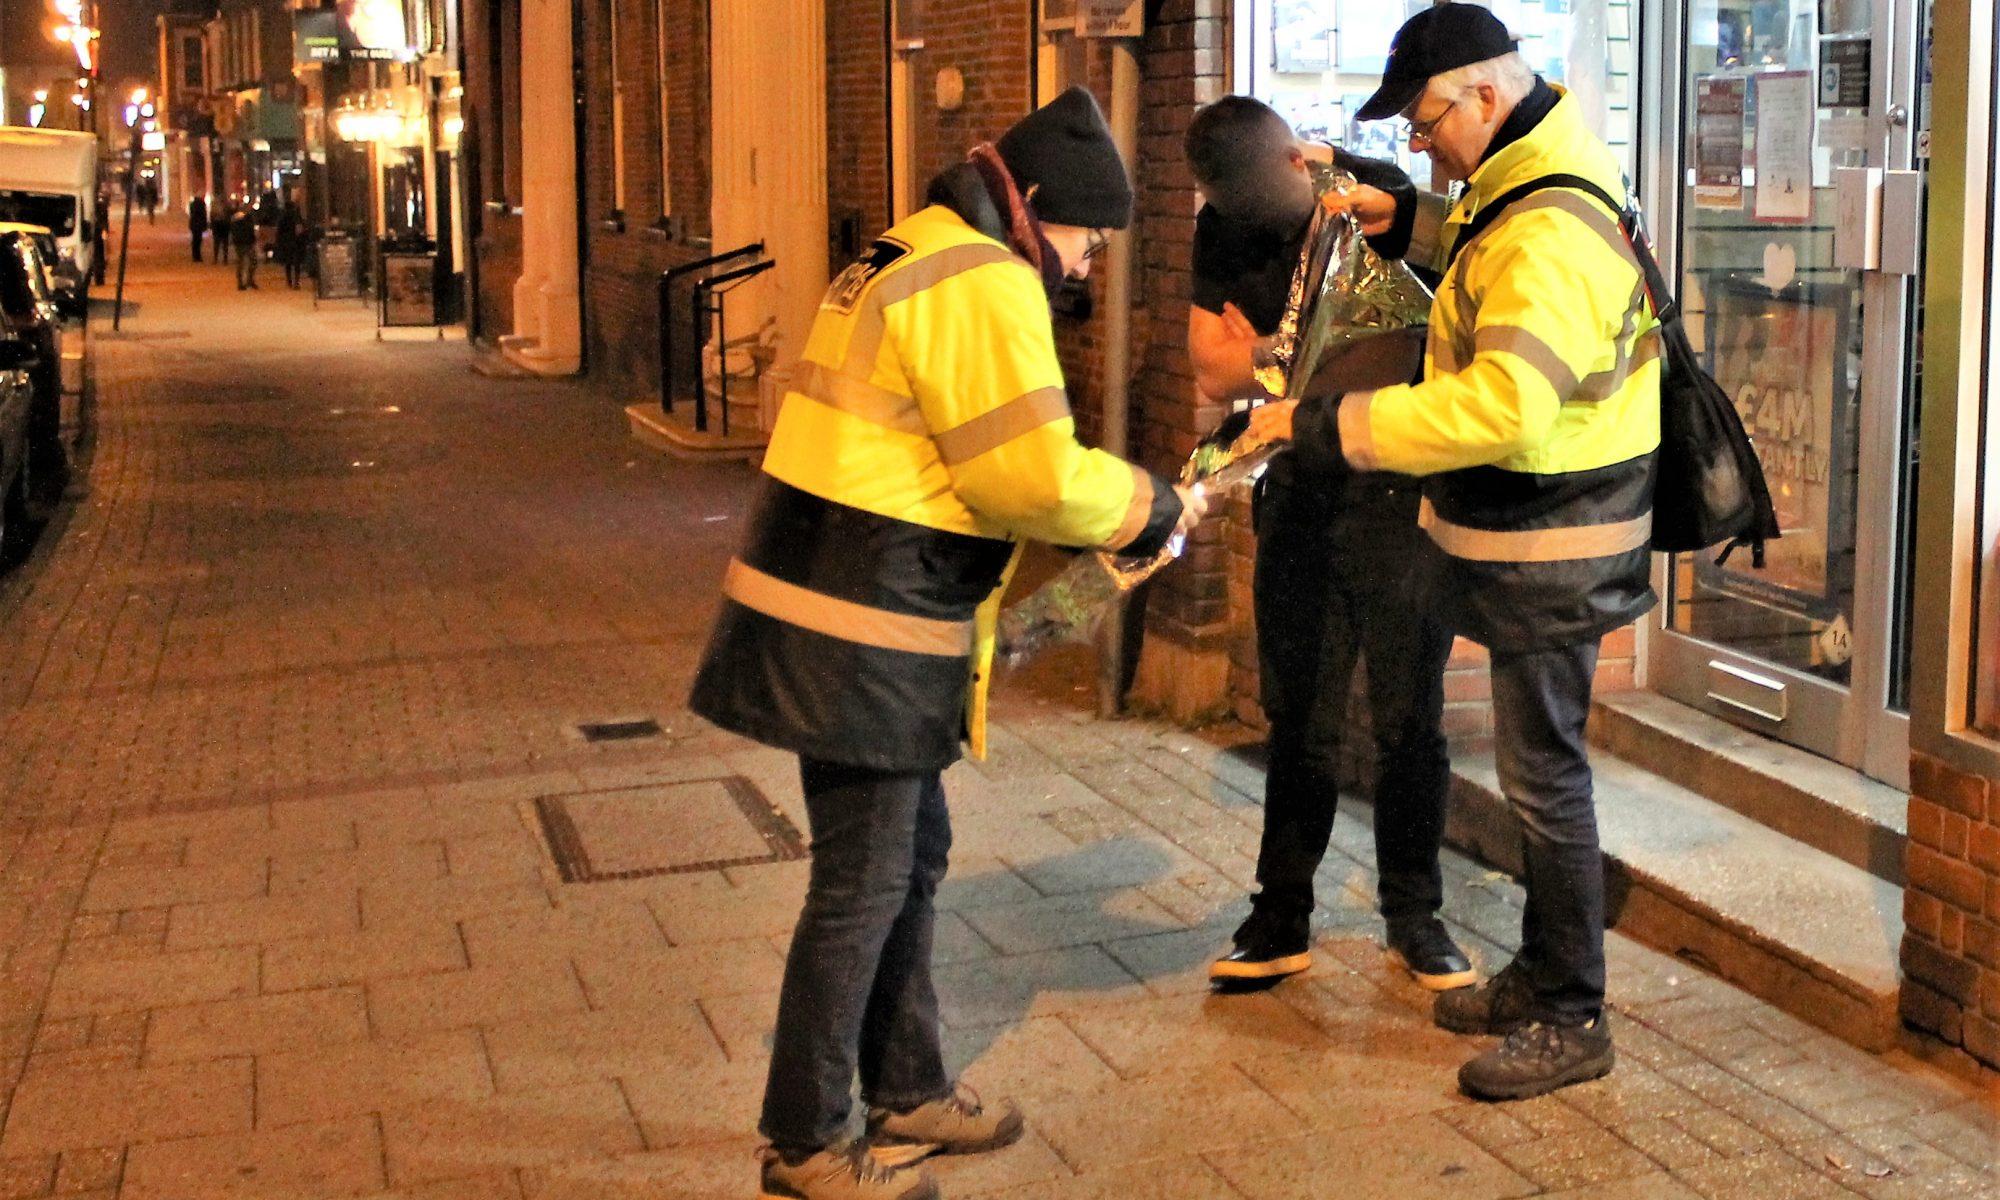 Town Pastors helping